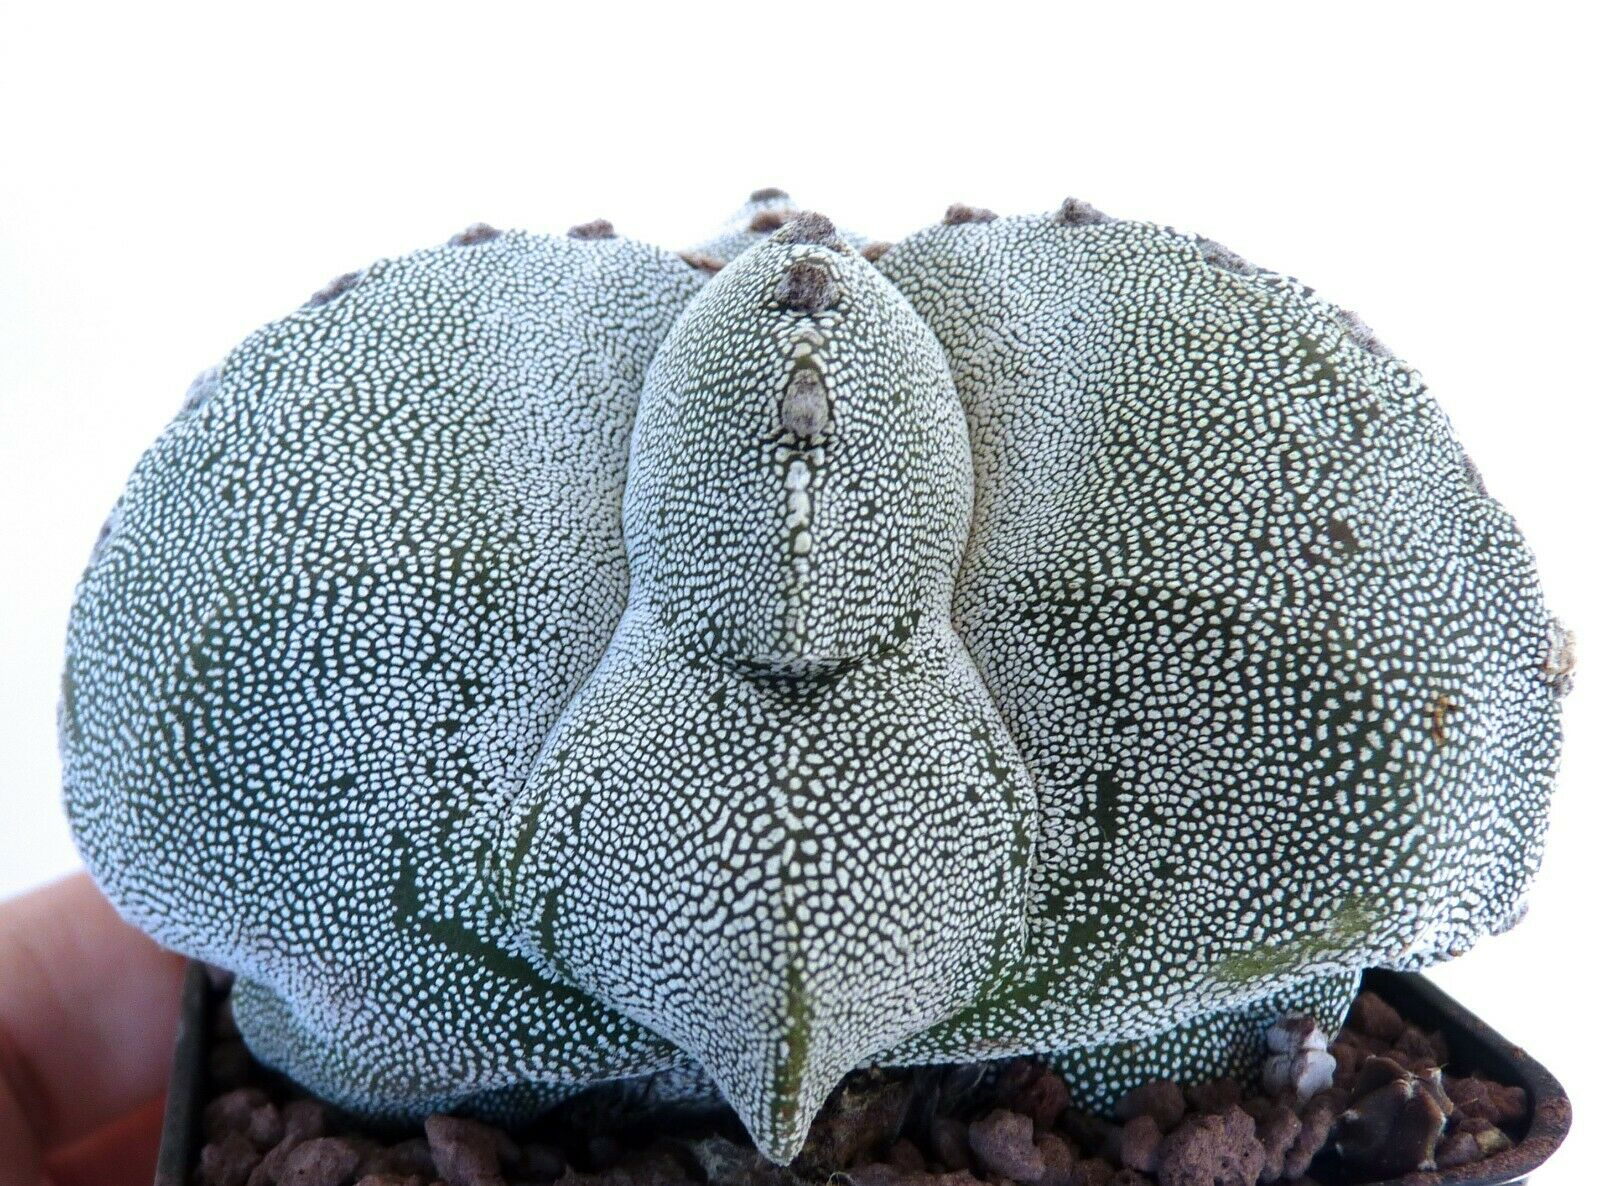 BIGG Astrophytum cv ONZUKA tricostatum X KIKKO major     (ex Japan import) FR9